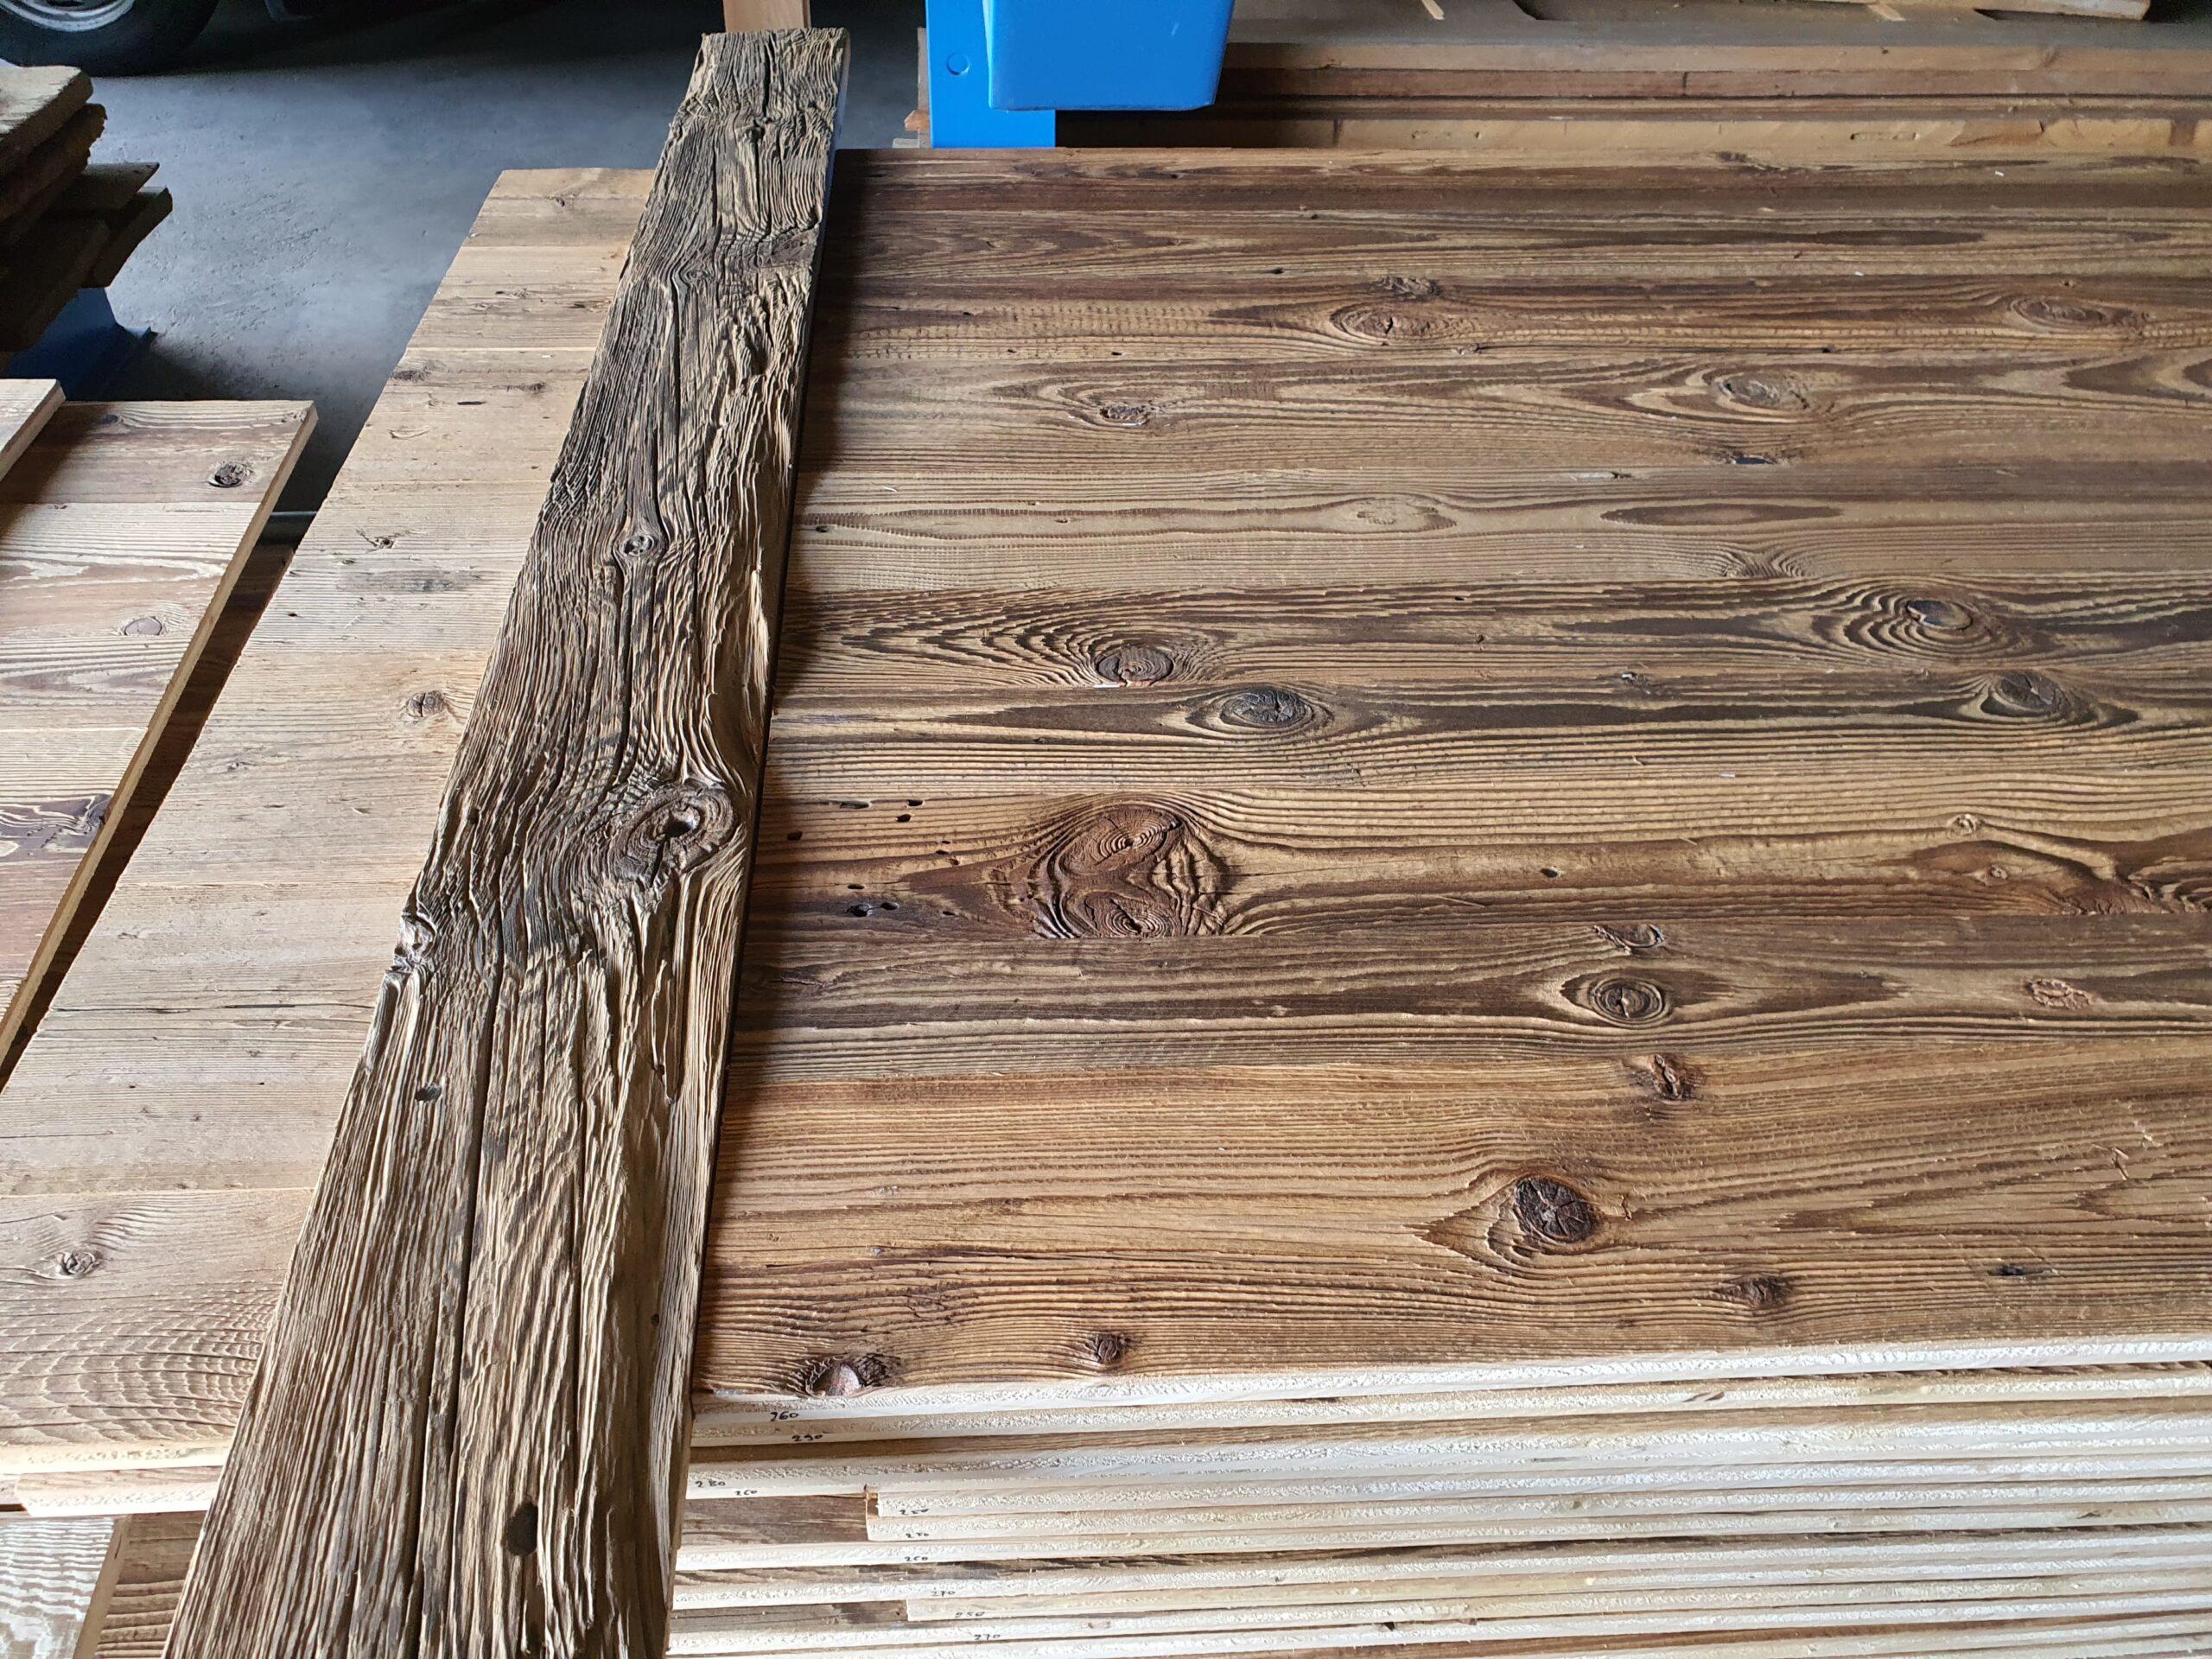 Wooddesign_Holzdesign_Altholzplatten_ Altholz_Eiche Altholz_Altholztäfer_alte Beschläge_Altholzkleidungen(1)